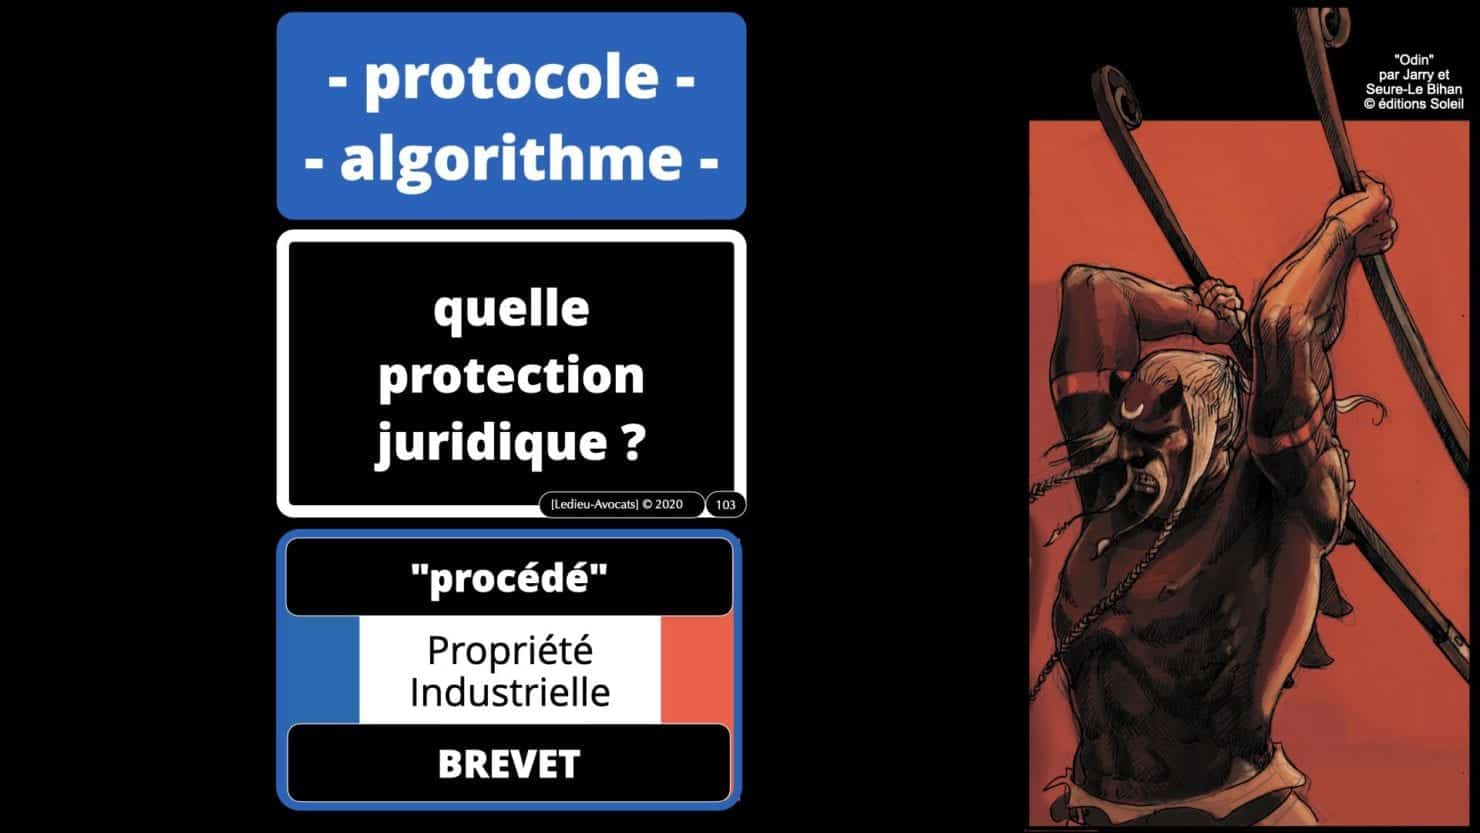 307 Intelligence artificielle-machine-learning-deep-learning-base de données-BIG-DATA *16:9* Constellation ©Ledieu-Avocat-13-10-2020.103